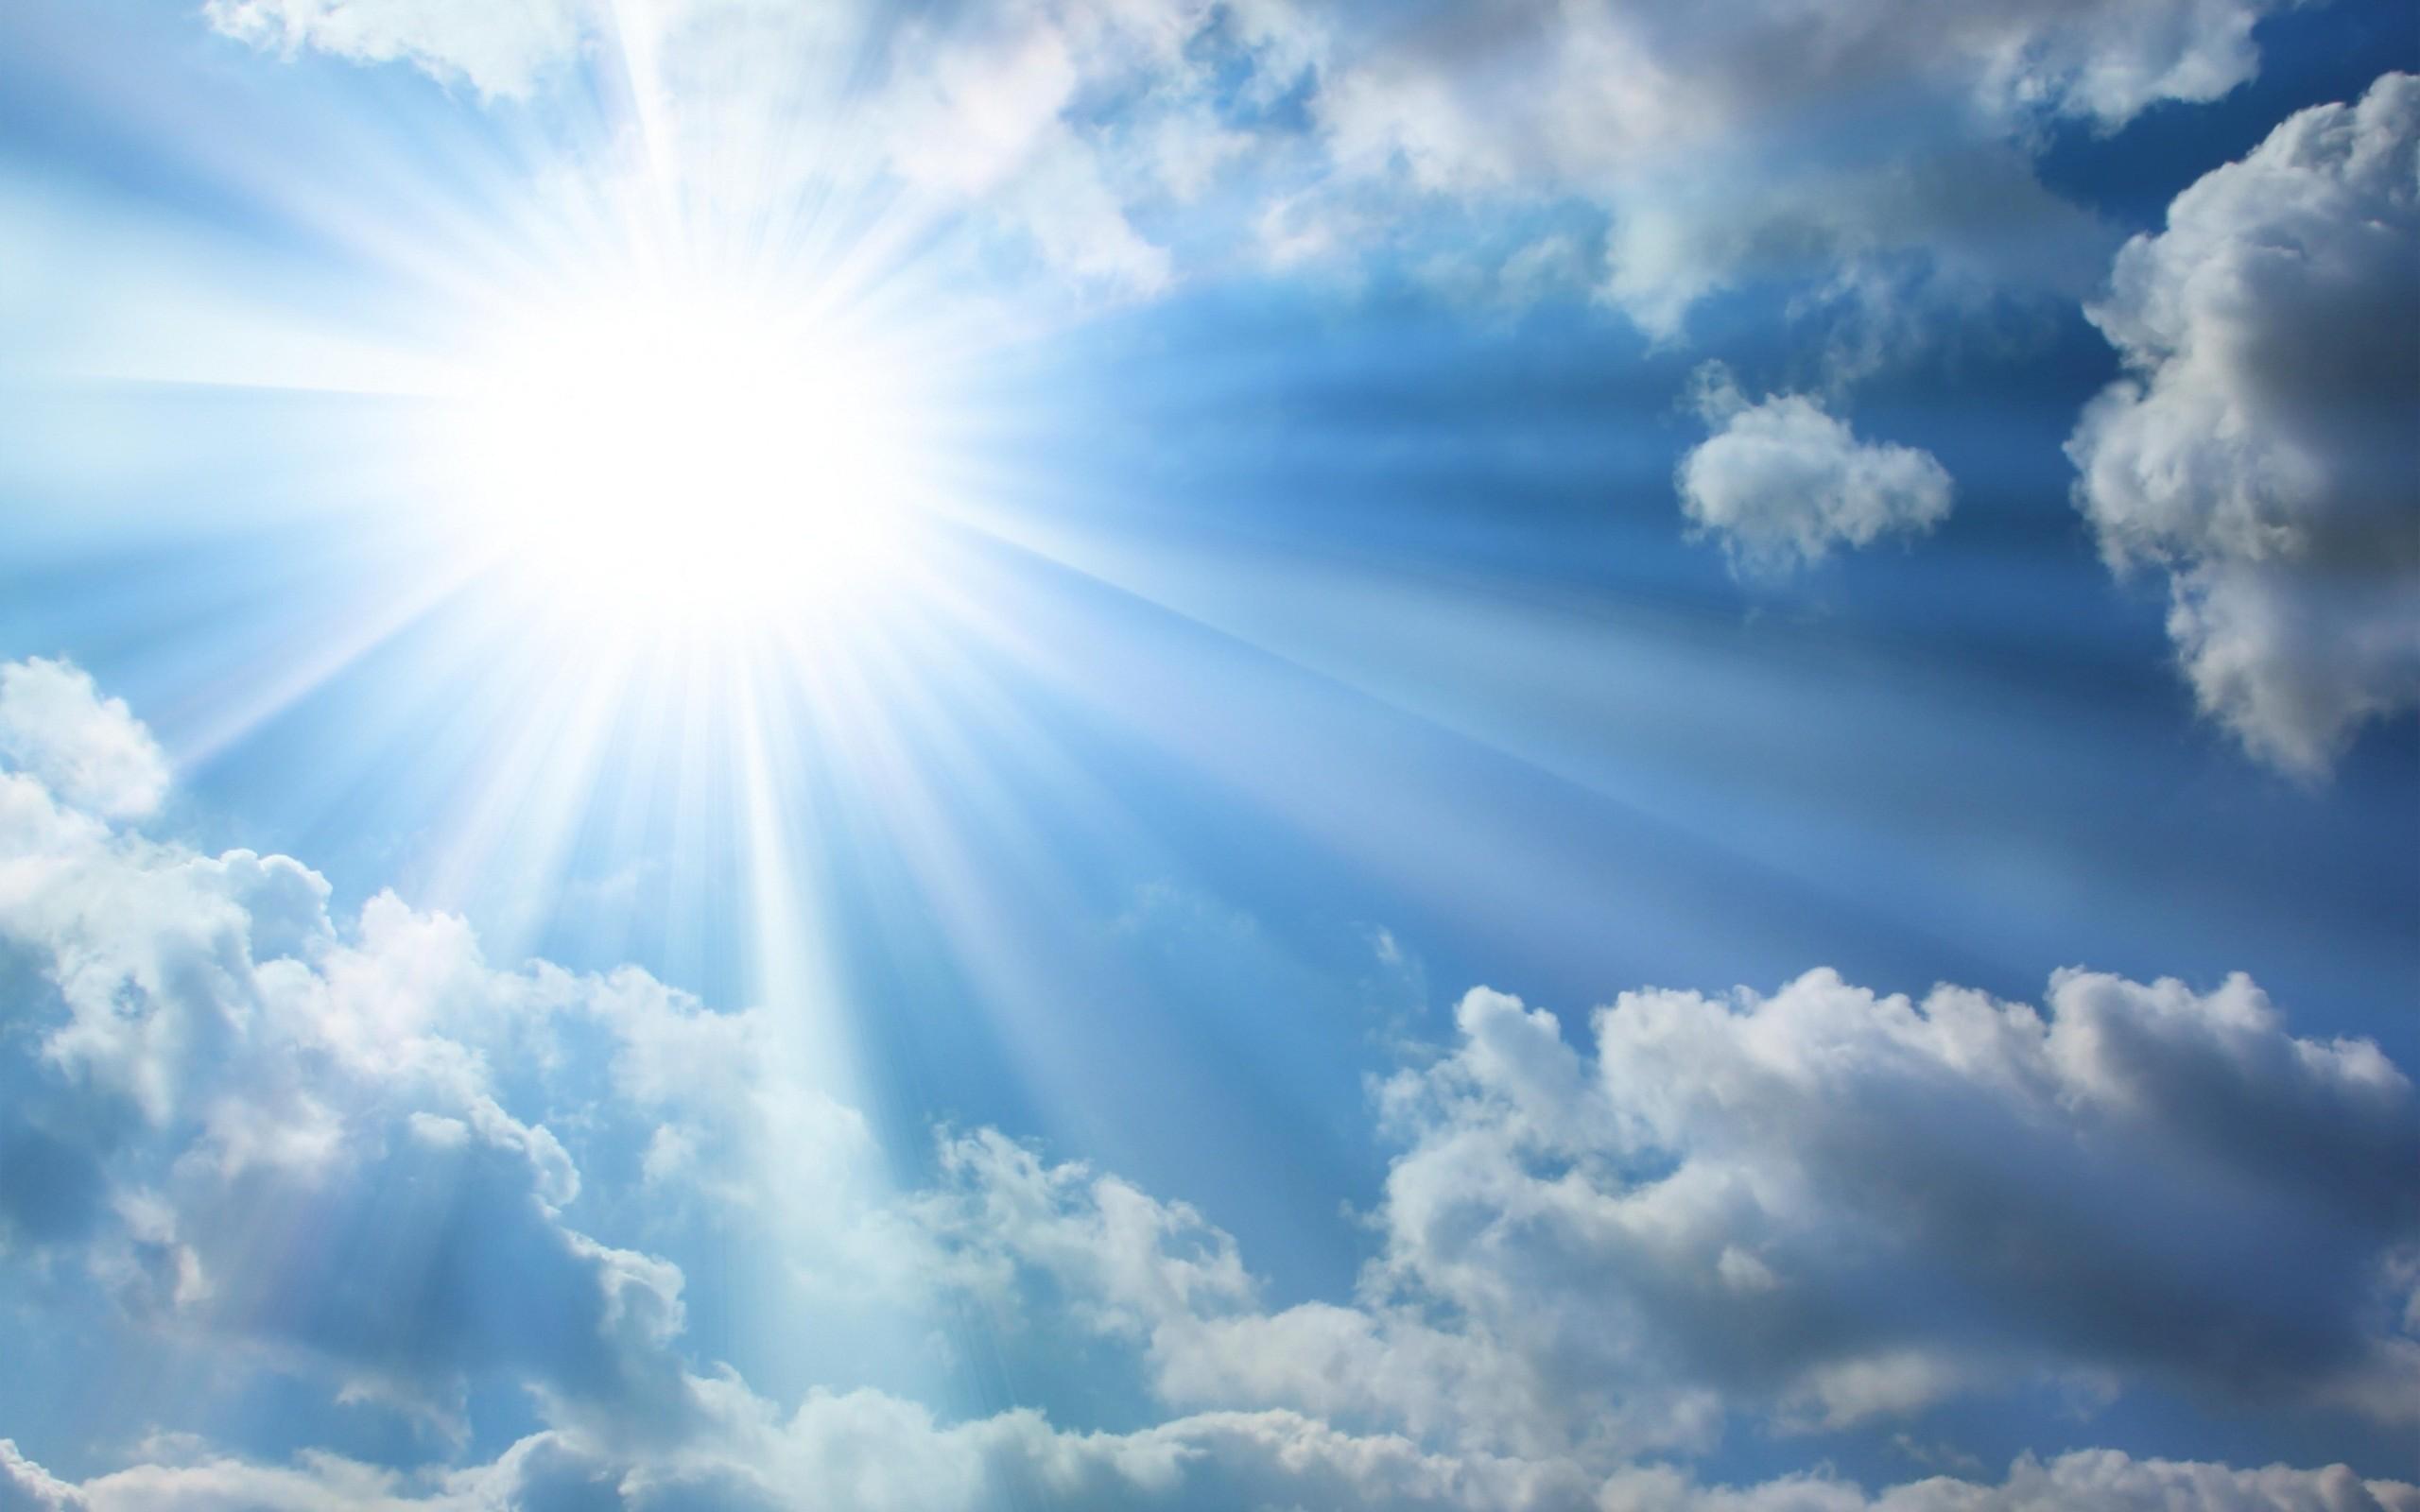 Sun clouds wallpaper HD.